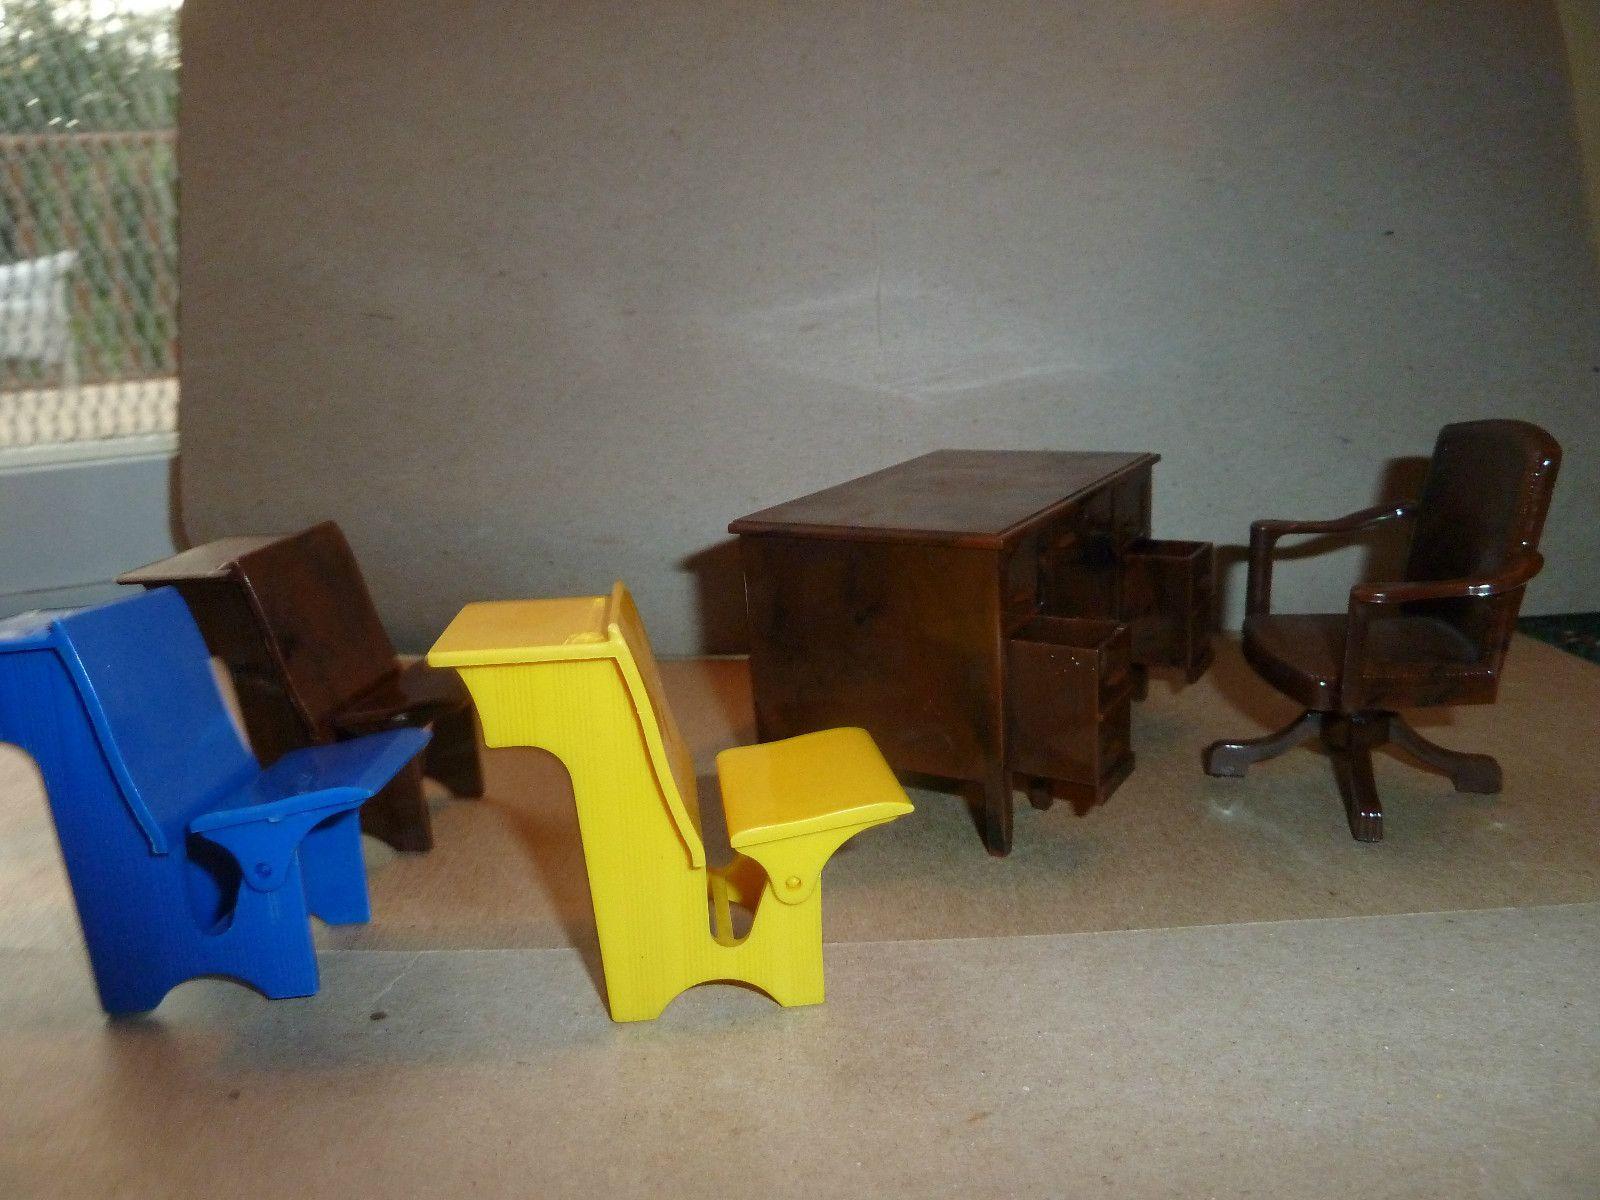 RENWAL SCHOOL HOUSE VINTAGE DOLLHOUSE FURNITURE | eBay